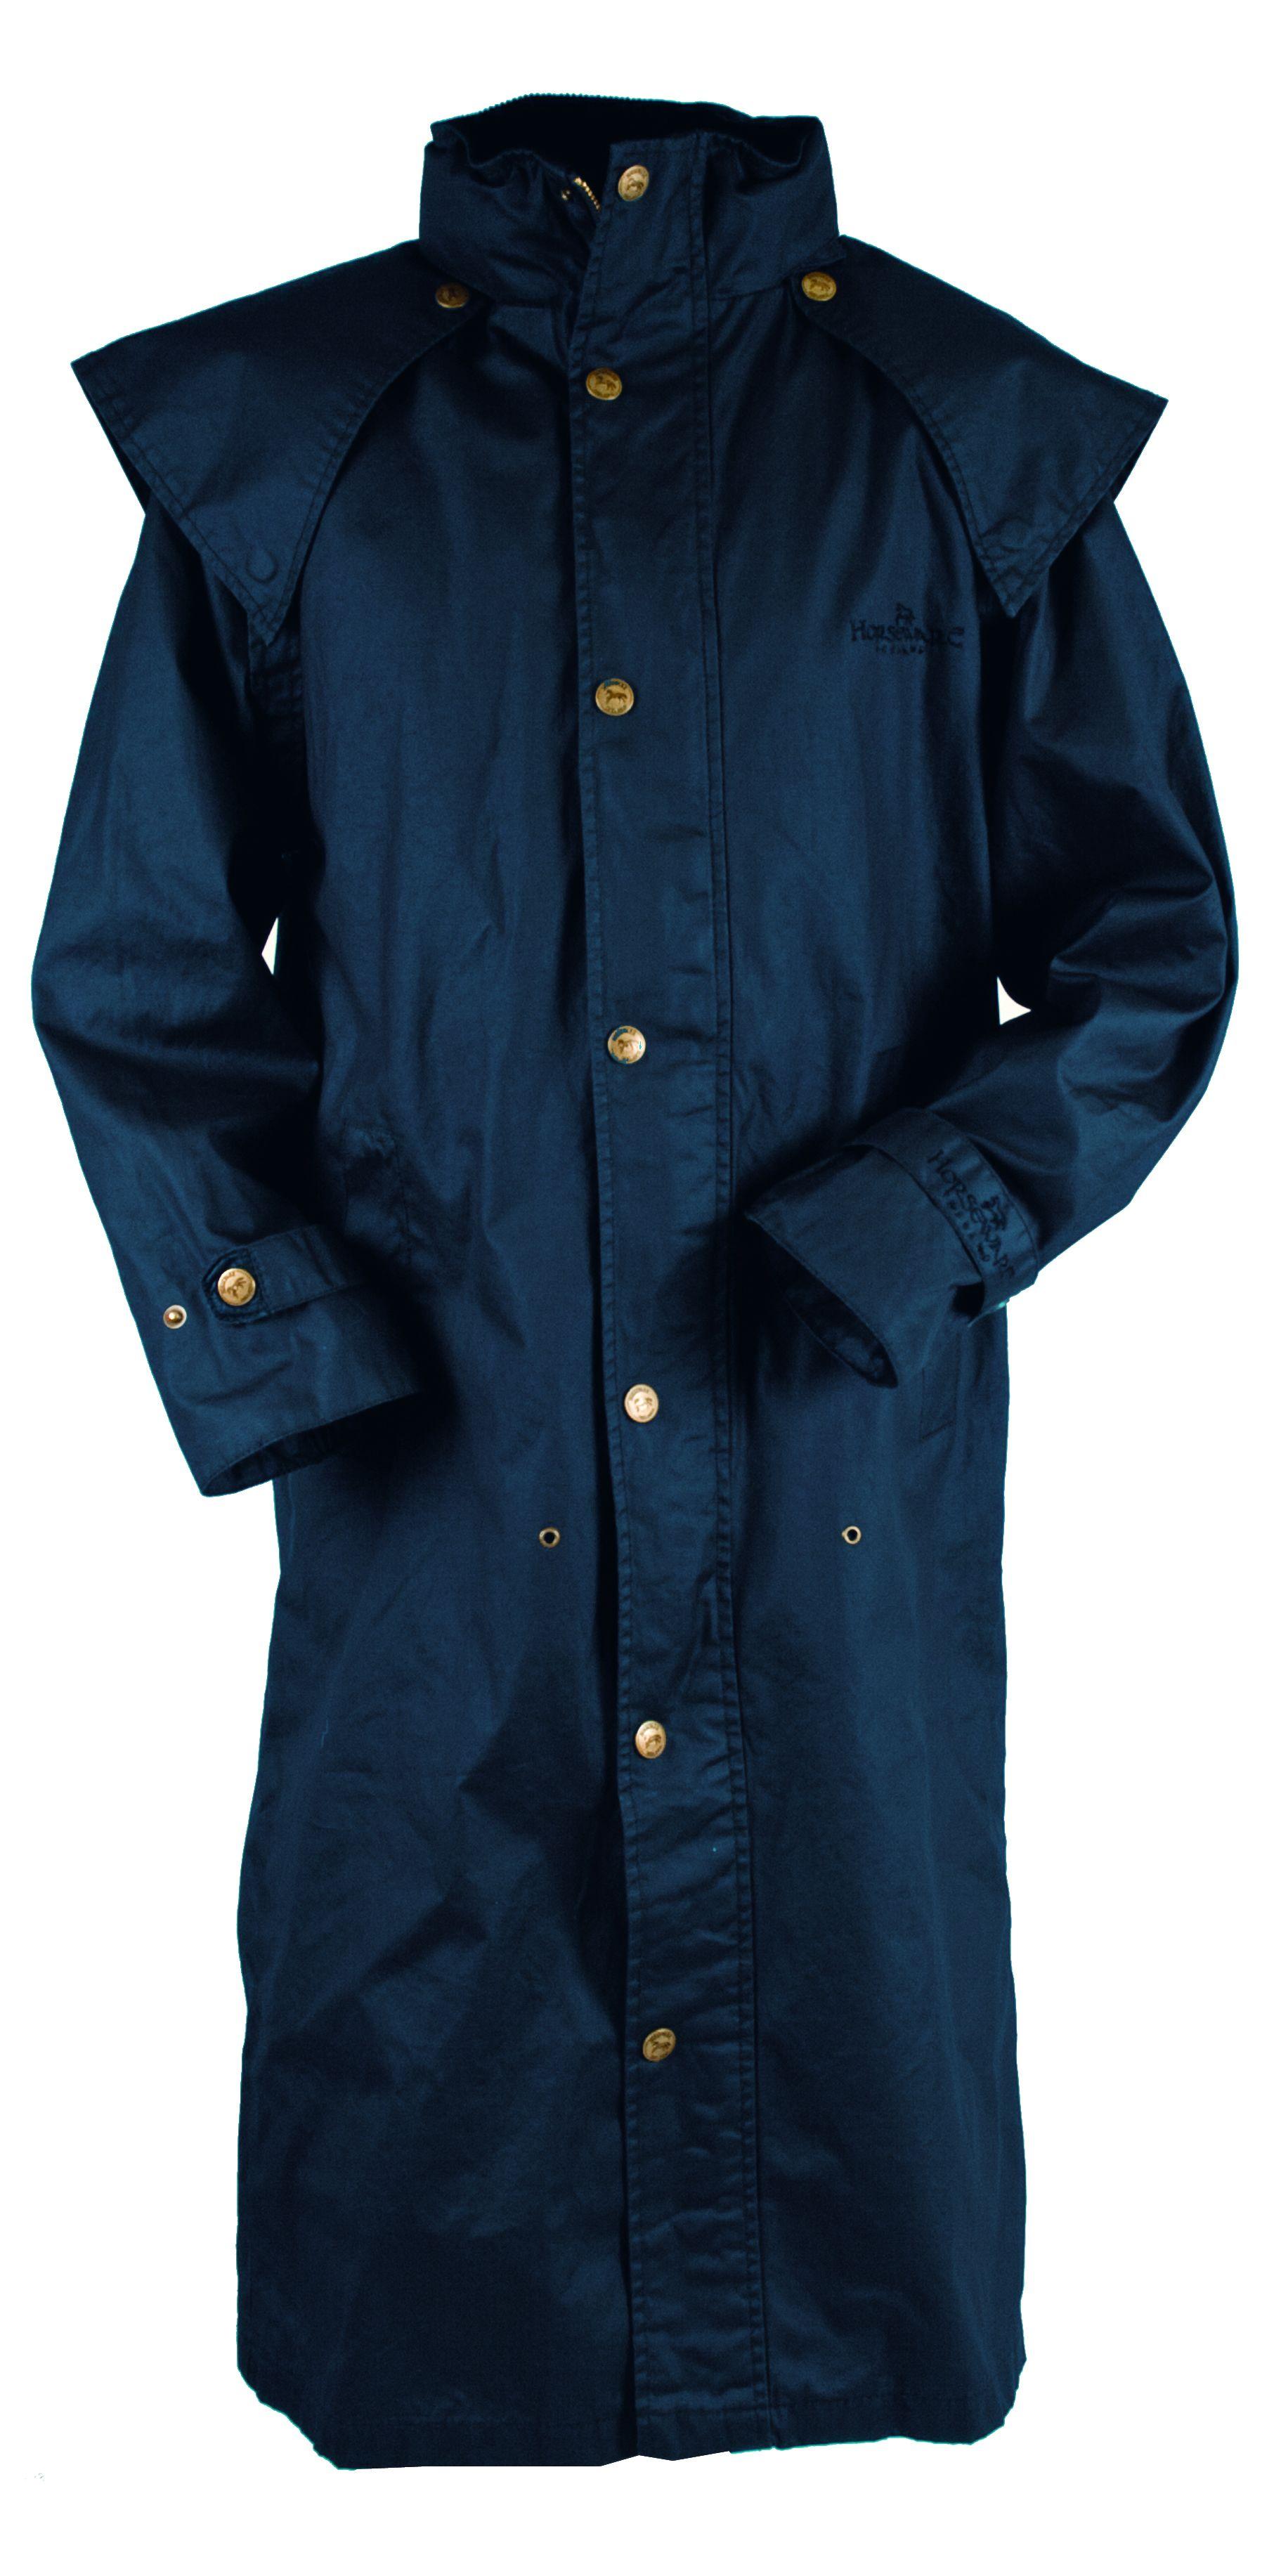 Horseware Unisex Galway Coat